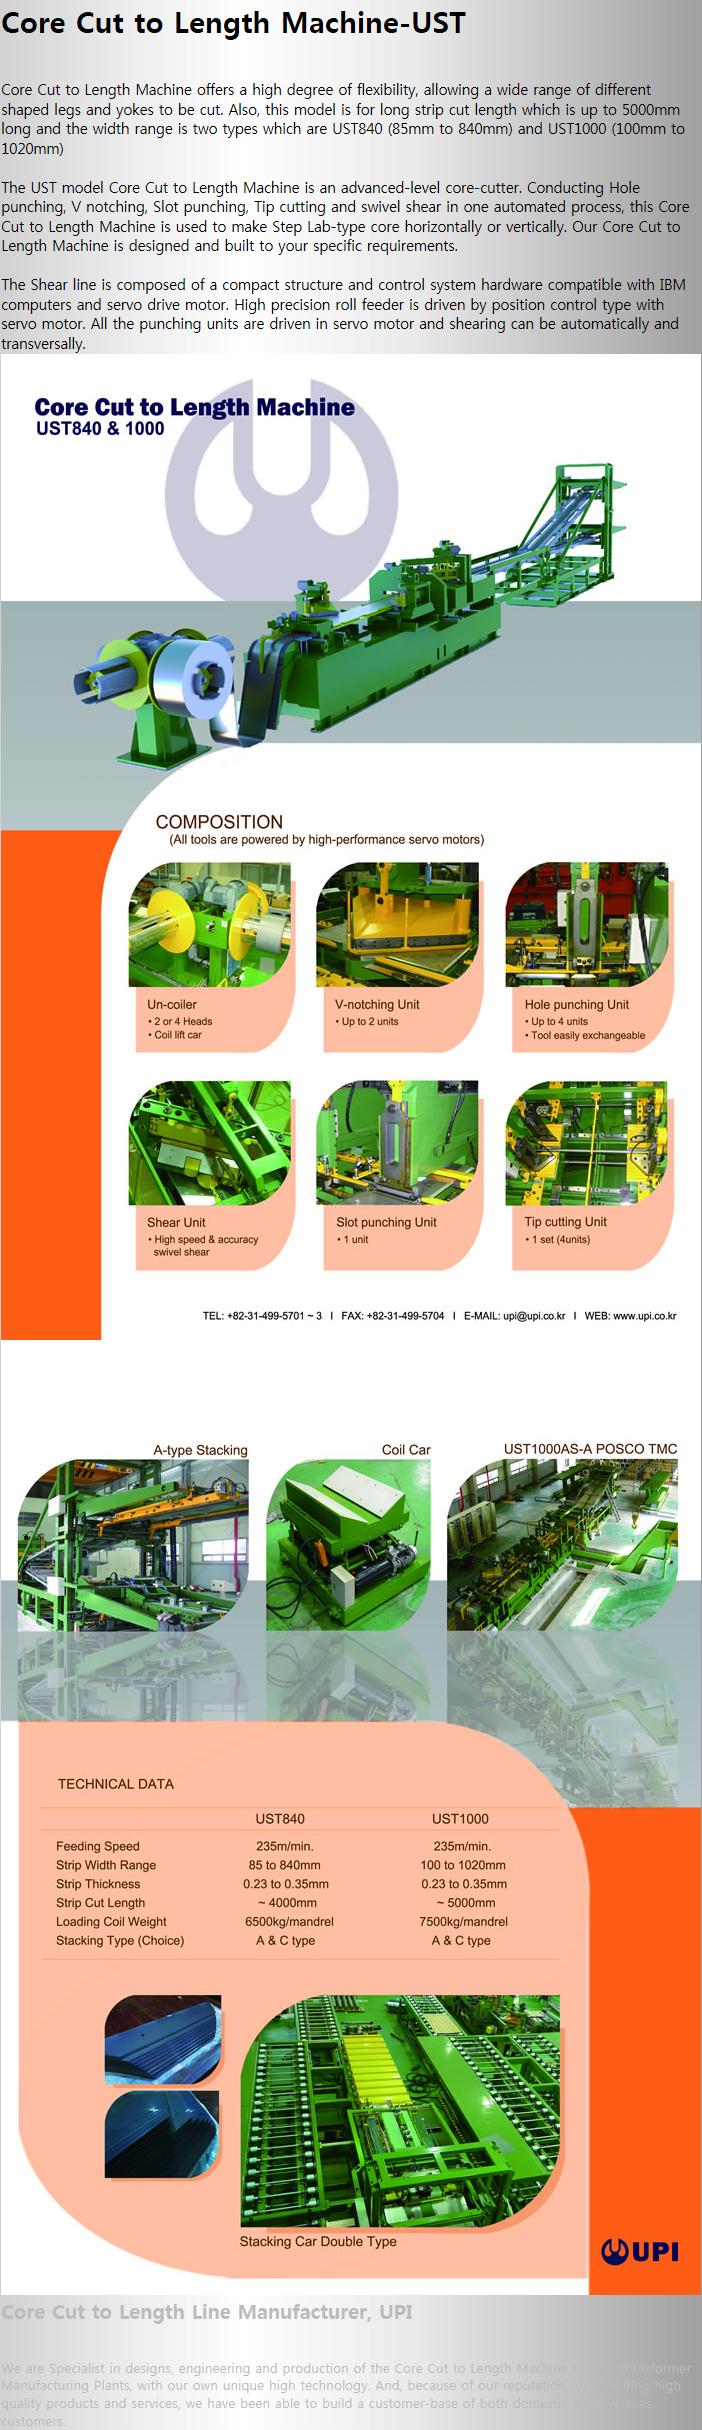 UPI Core Cut to Length Machine UST